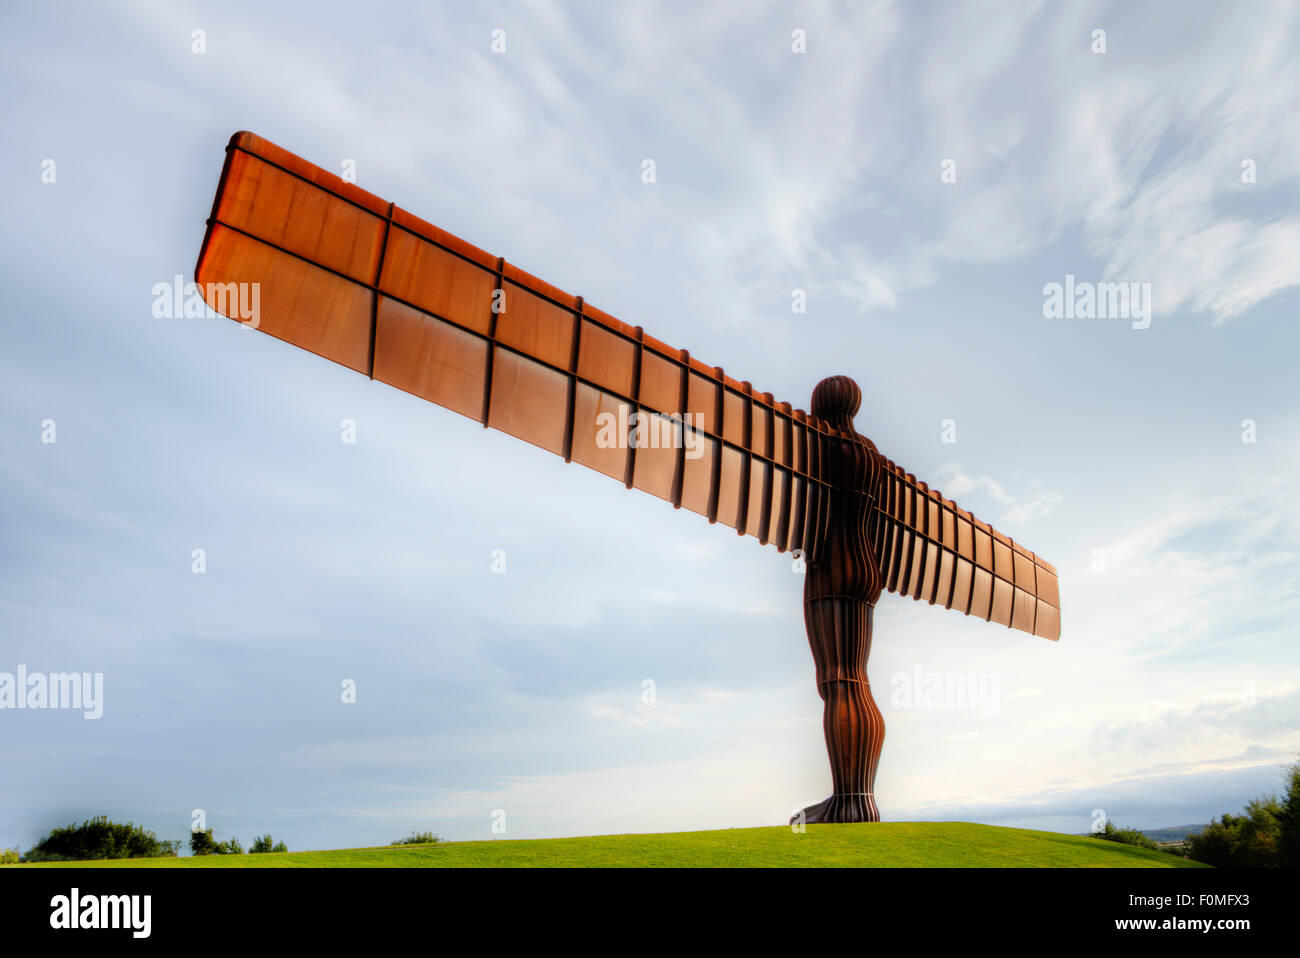 The Angel of the North, Gateshead, Tyne and Wear, UK - Stock Image